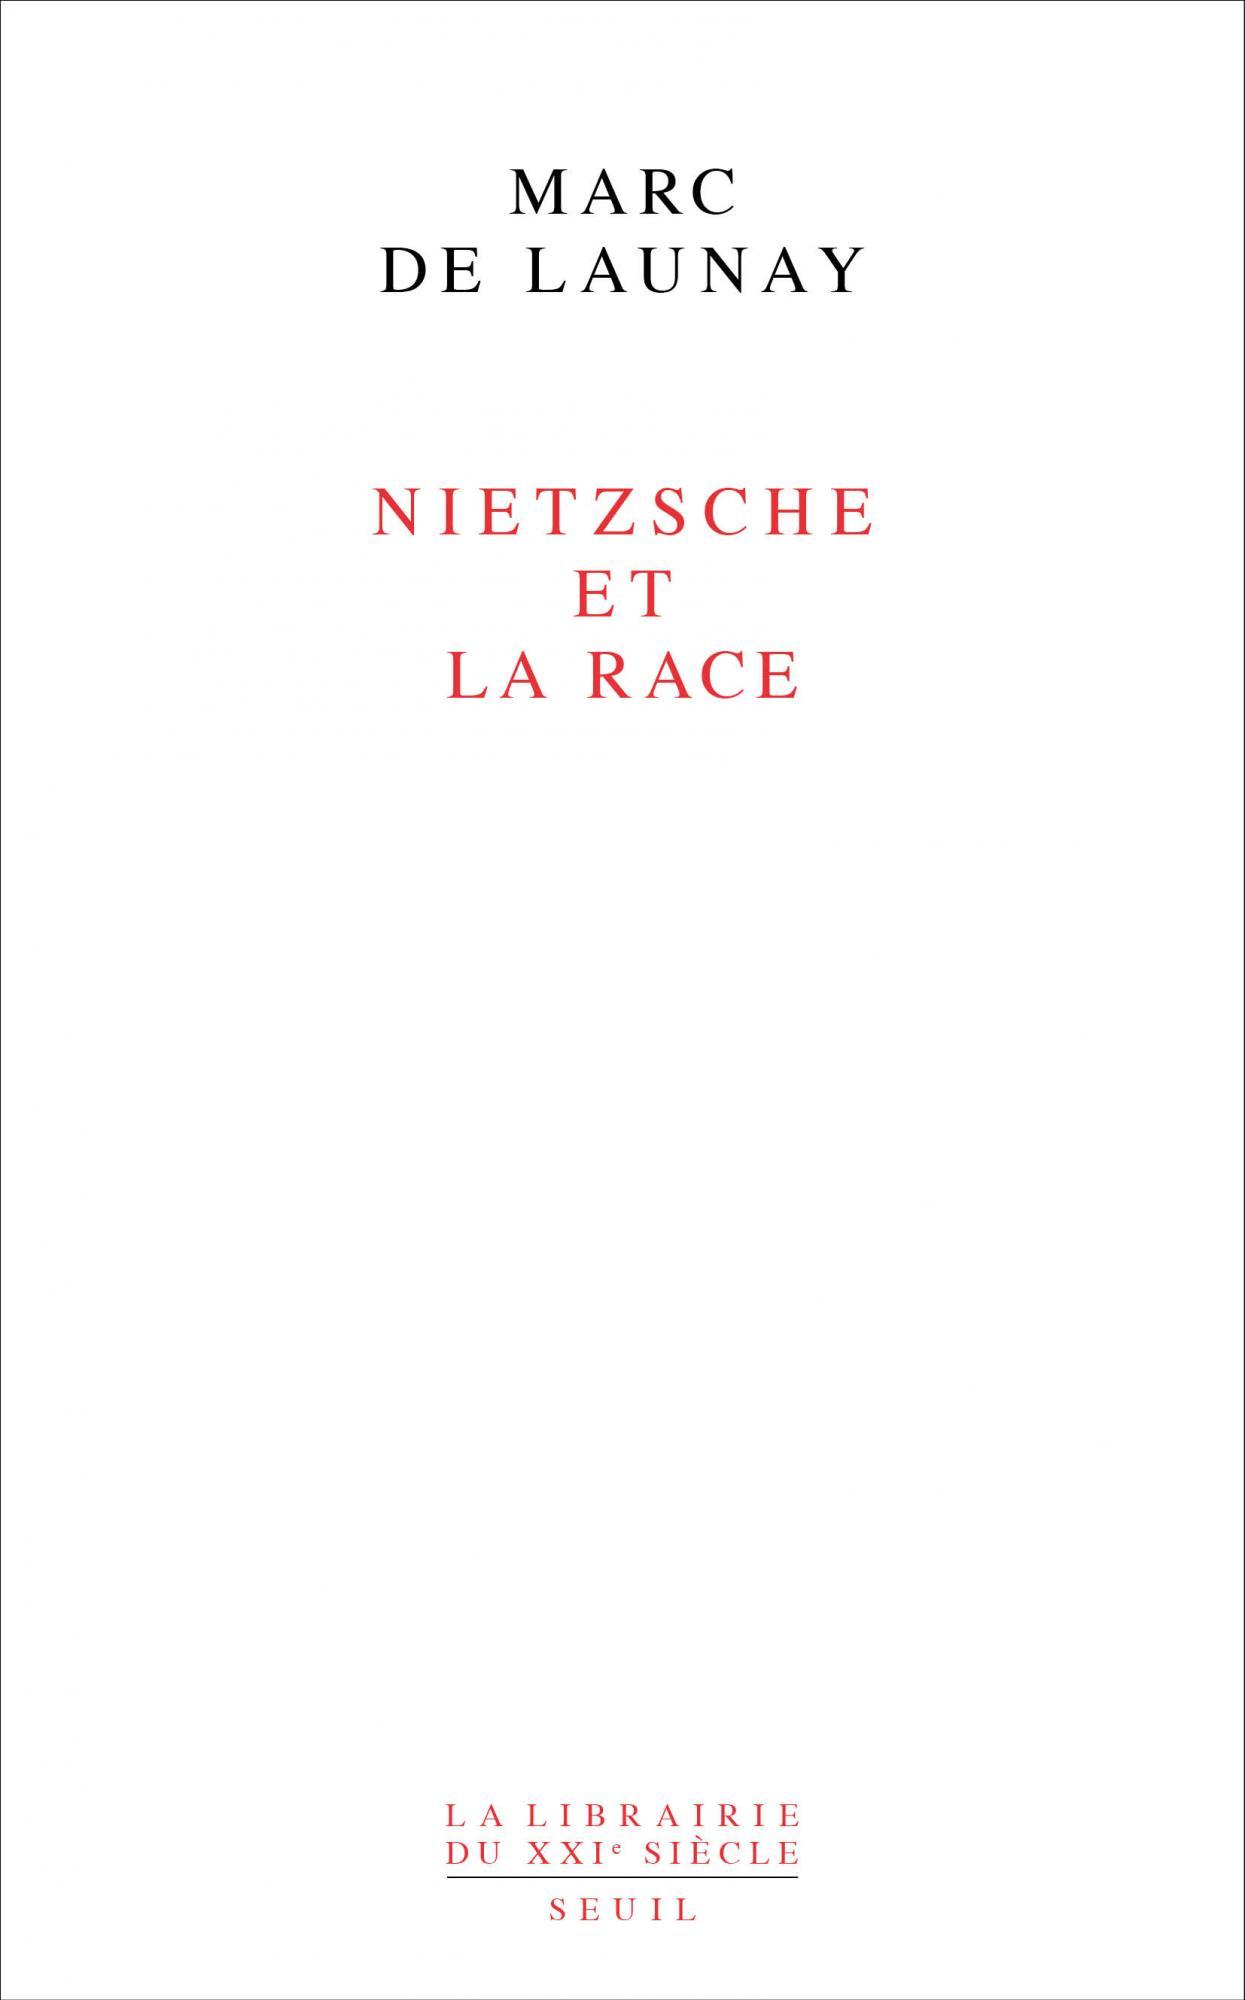 M. de Launay, Nietzsche et la race